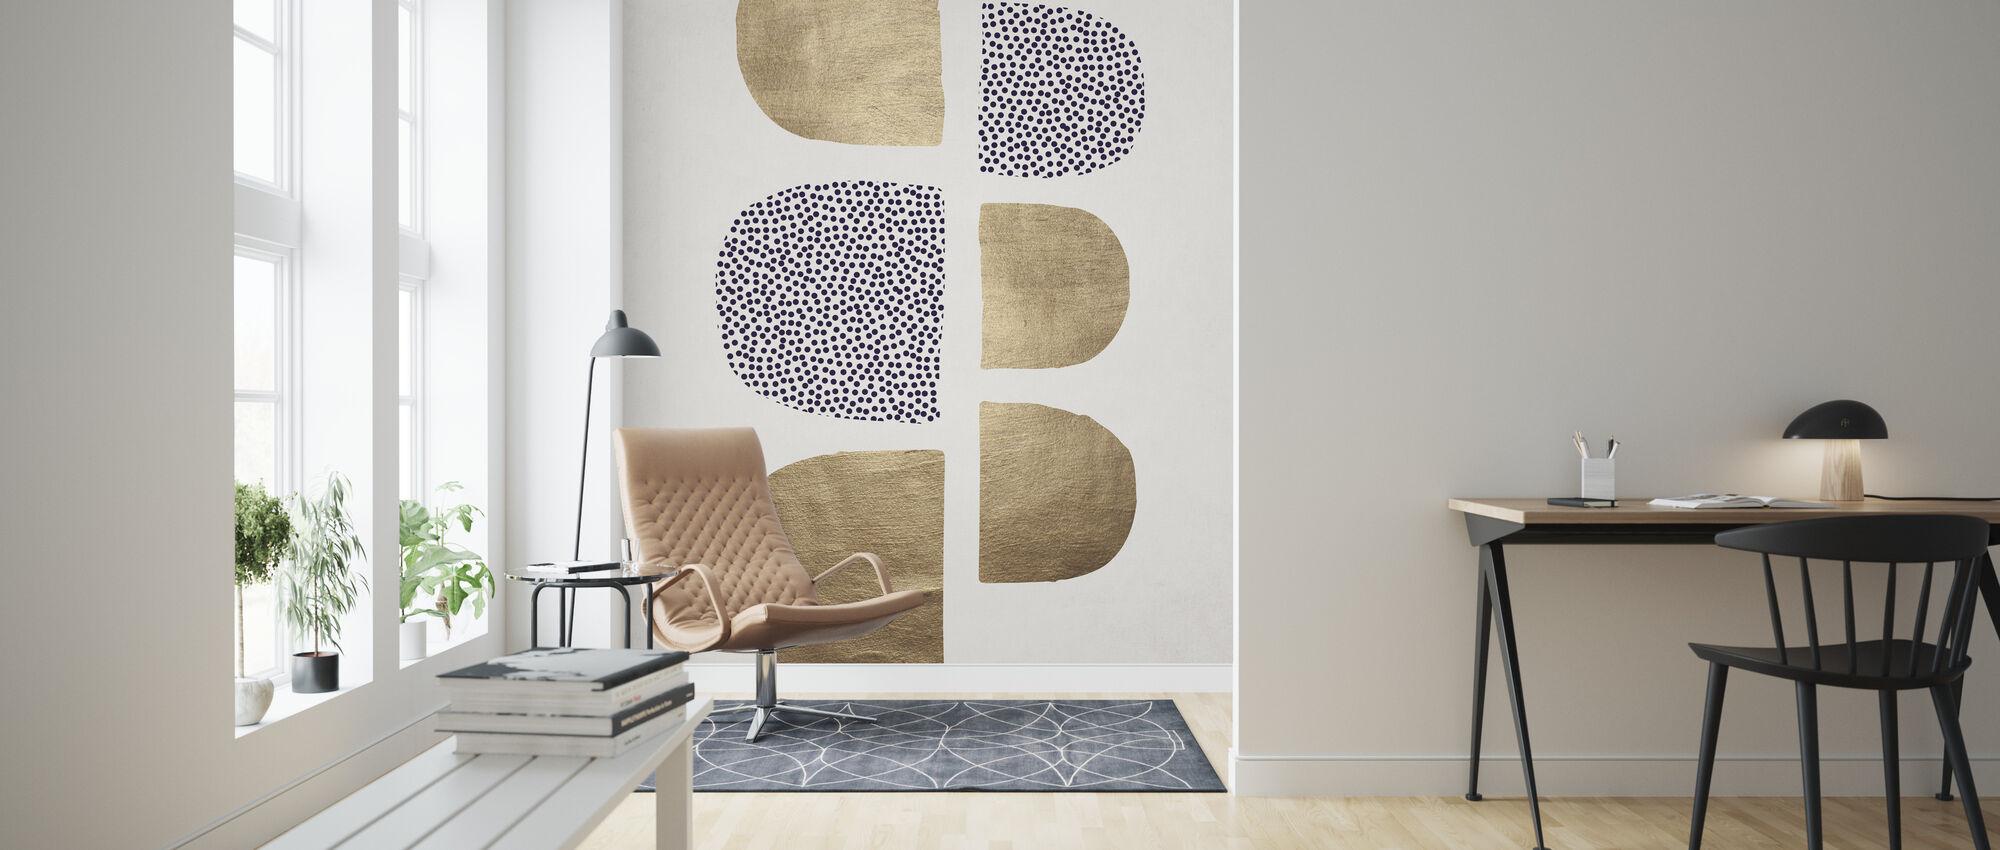 Geometric Abstracta - Wallpaper - Living Room